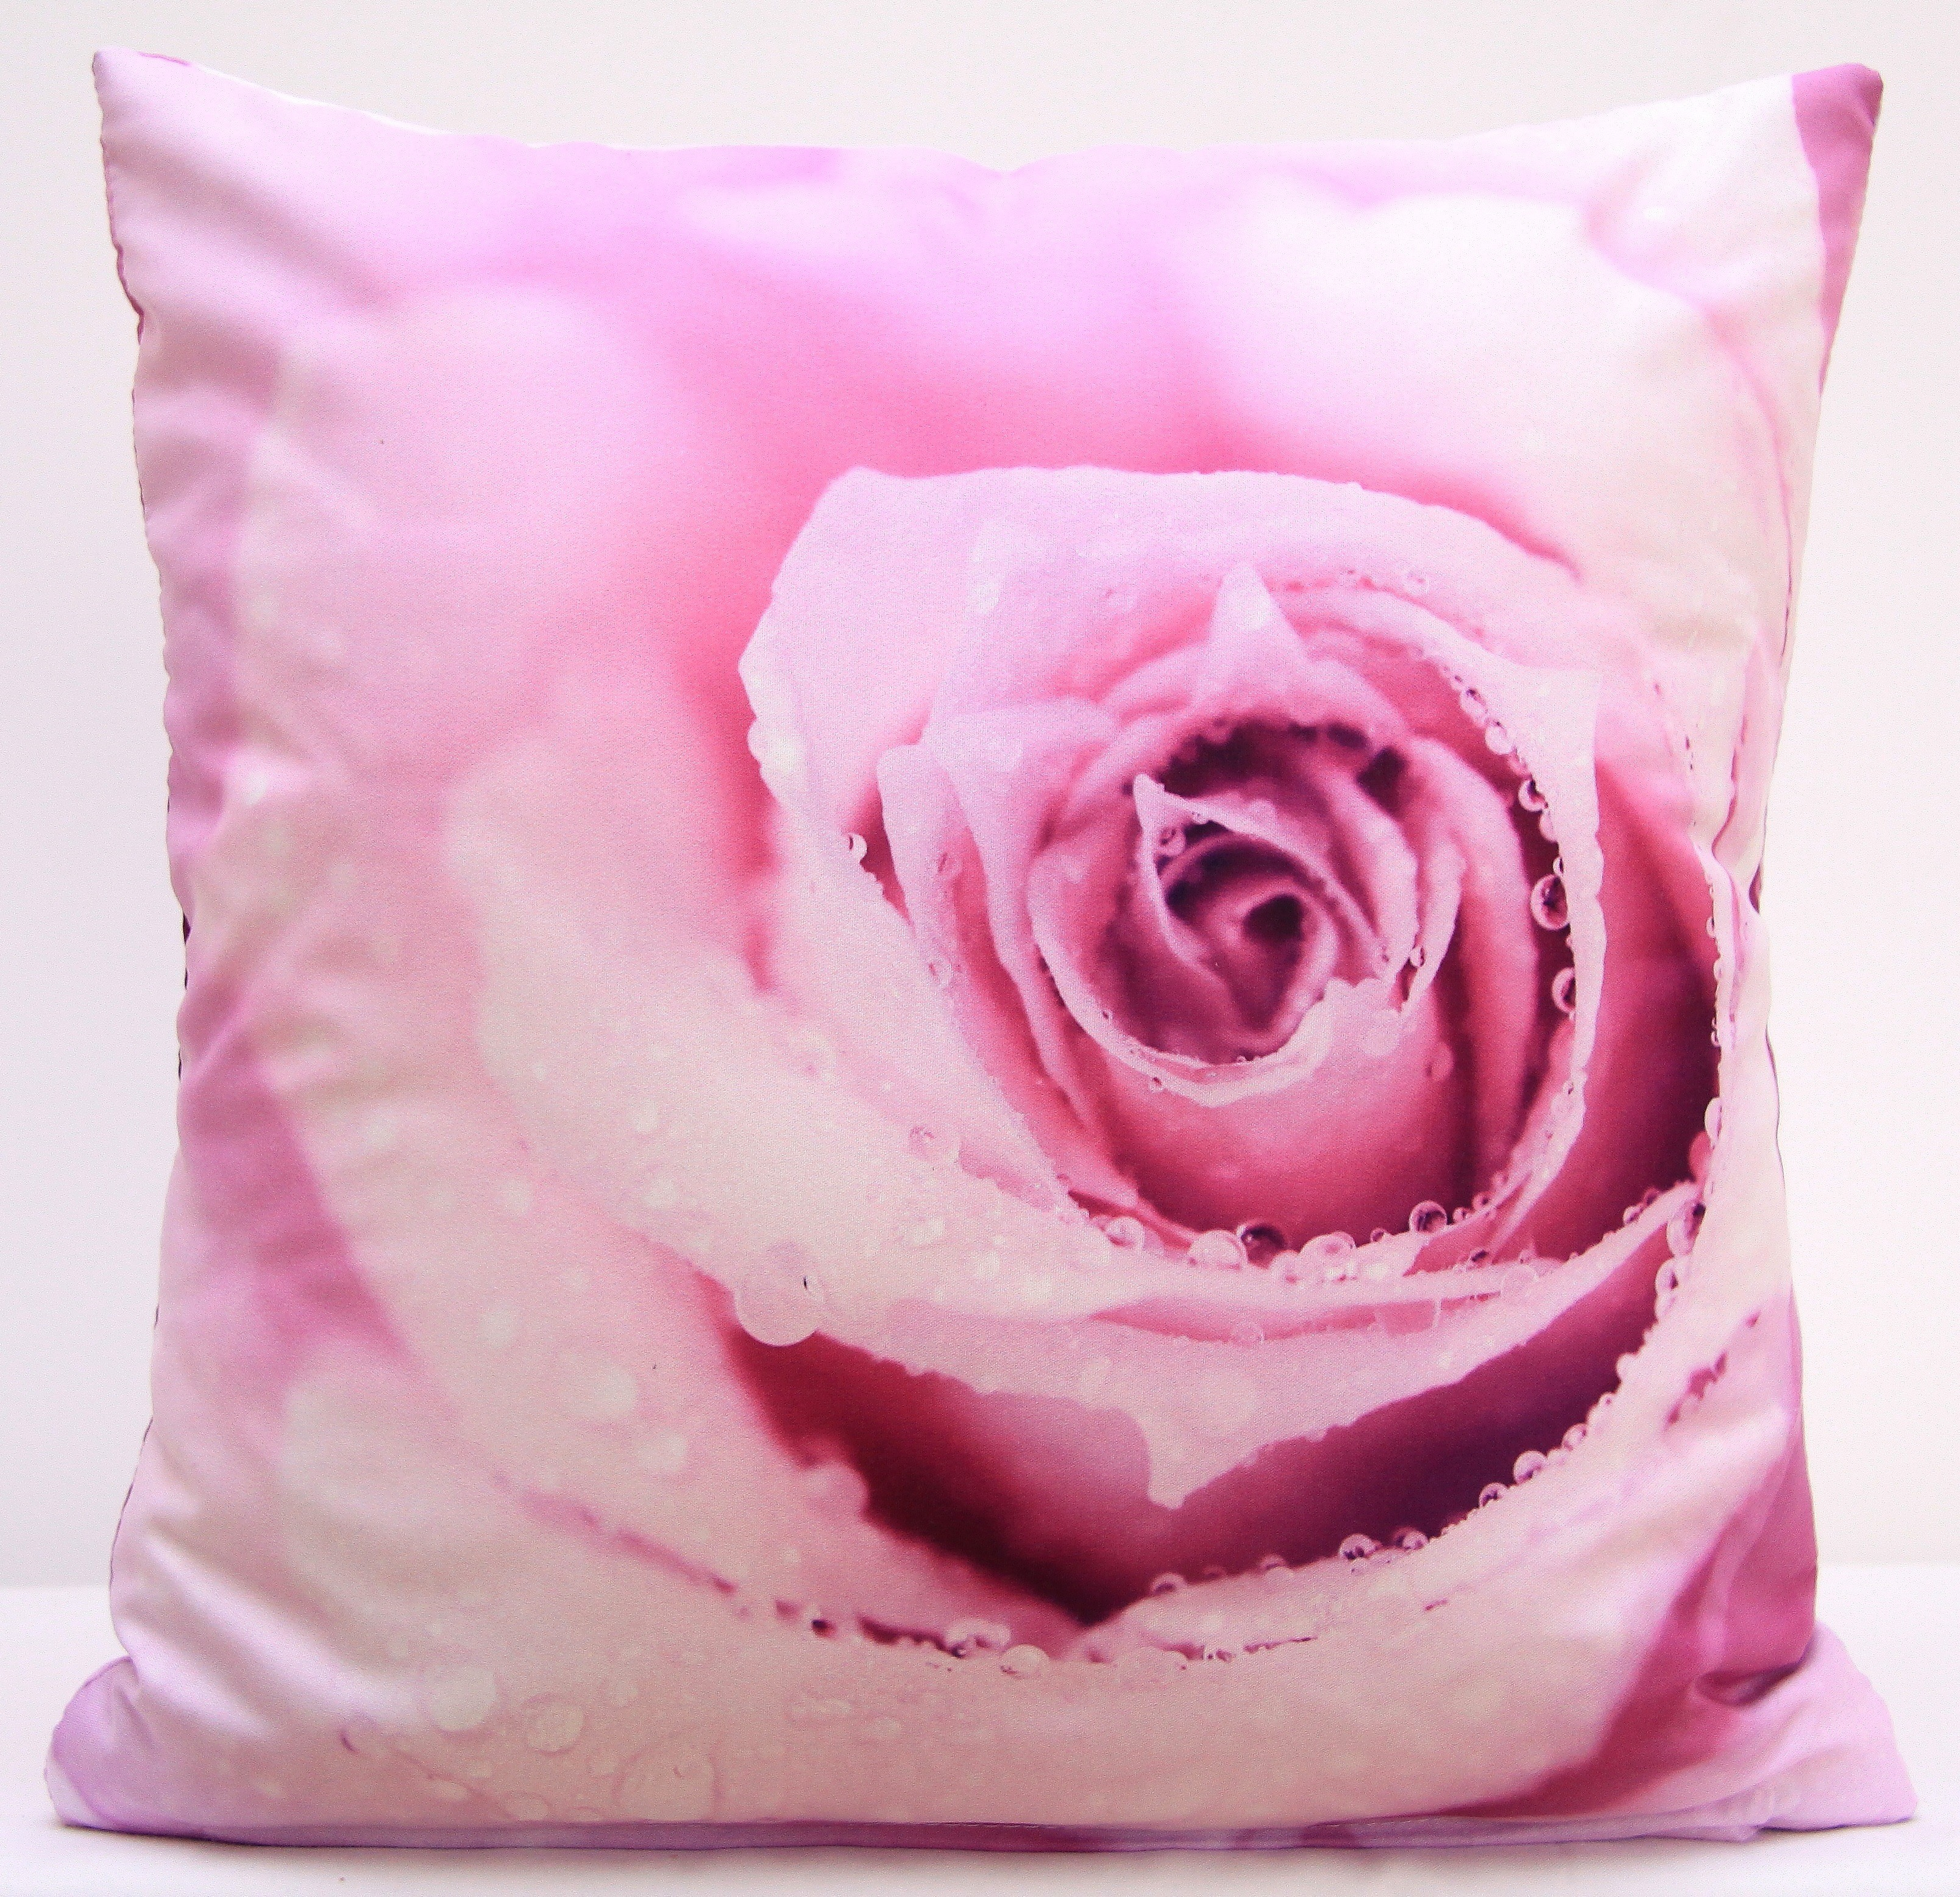 Povlak na polštář růžové barvy s motivem růžové růže